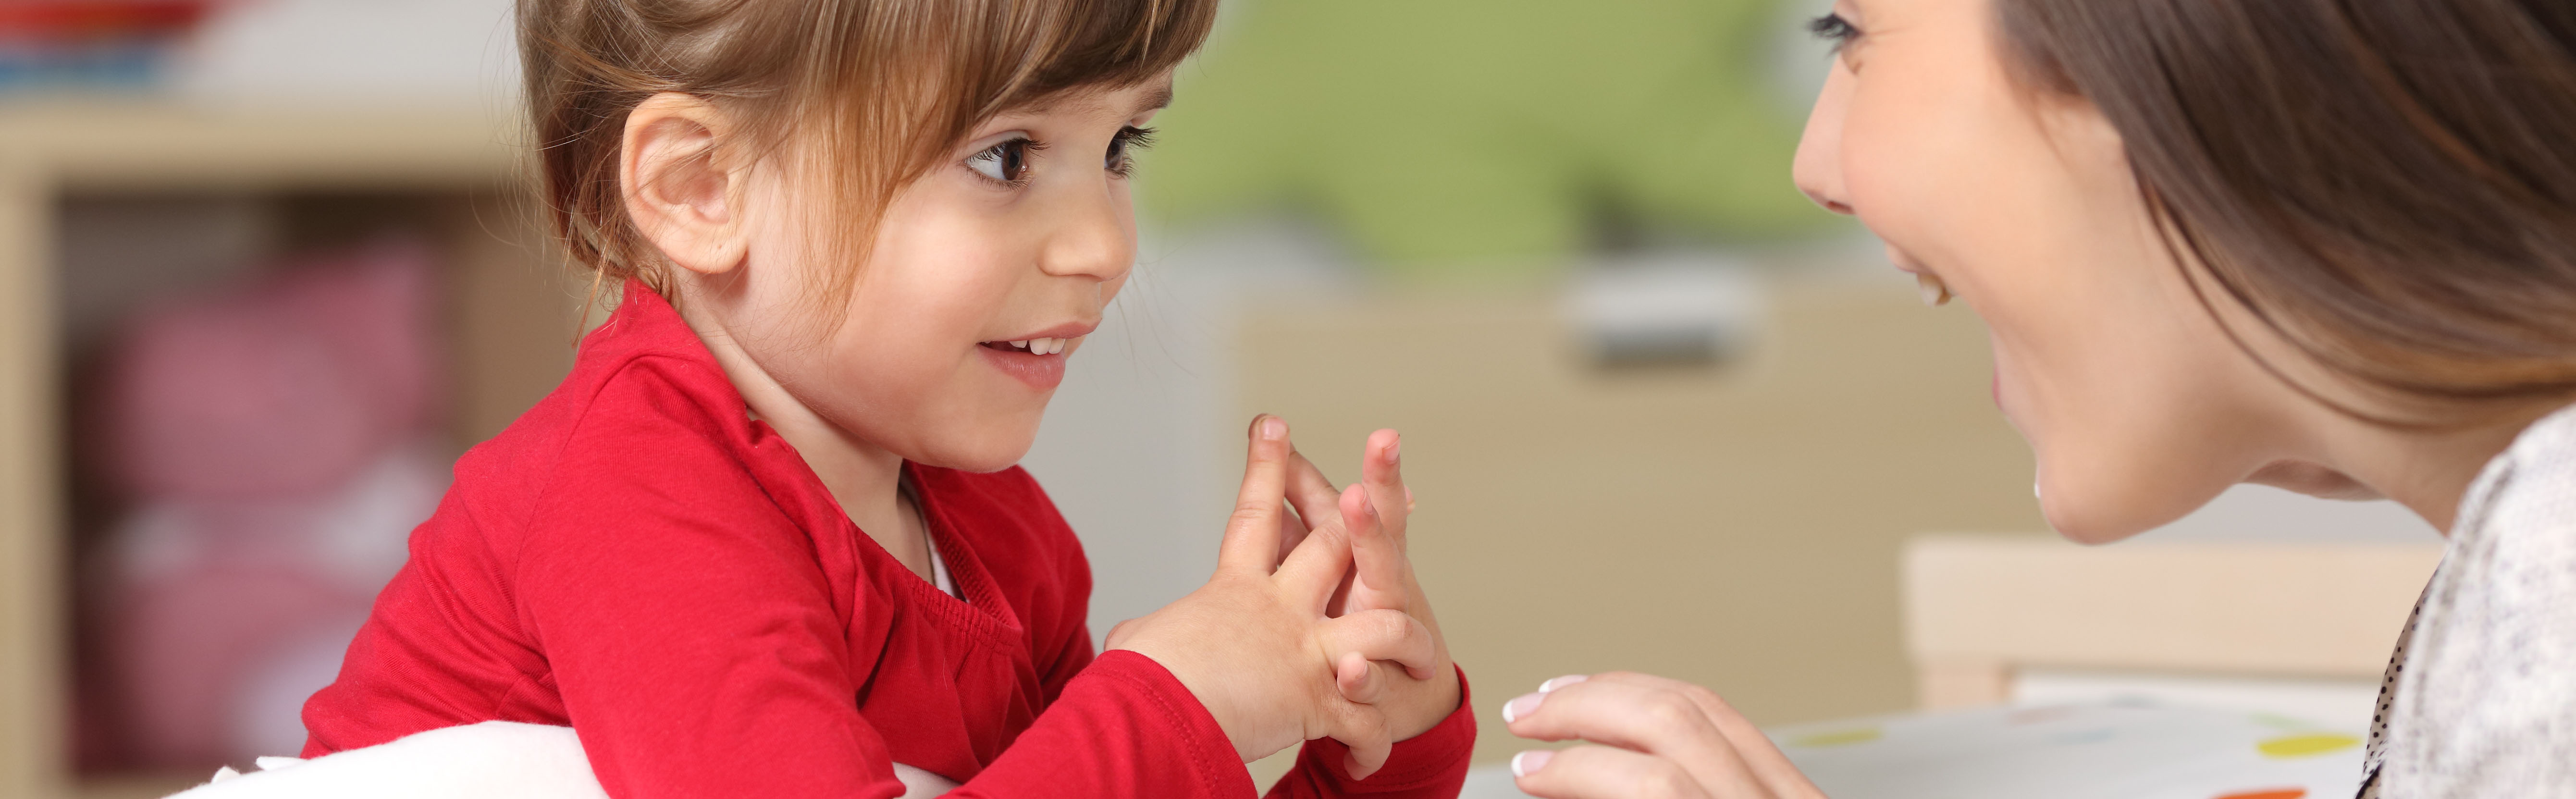 pediatric-patient-talking-to-pelvic-therapist